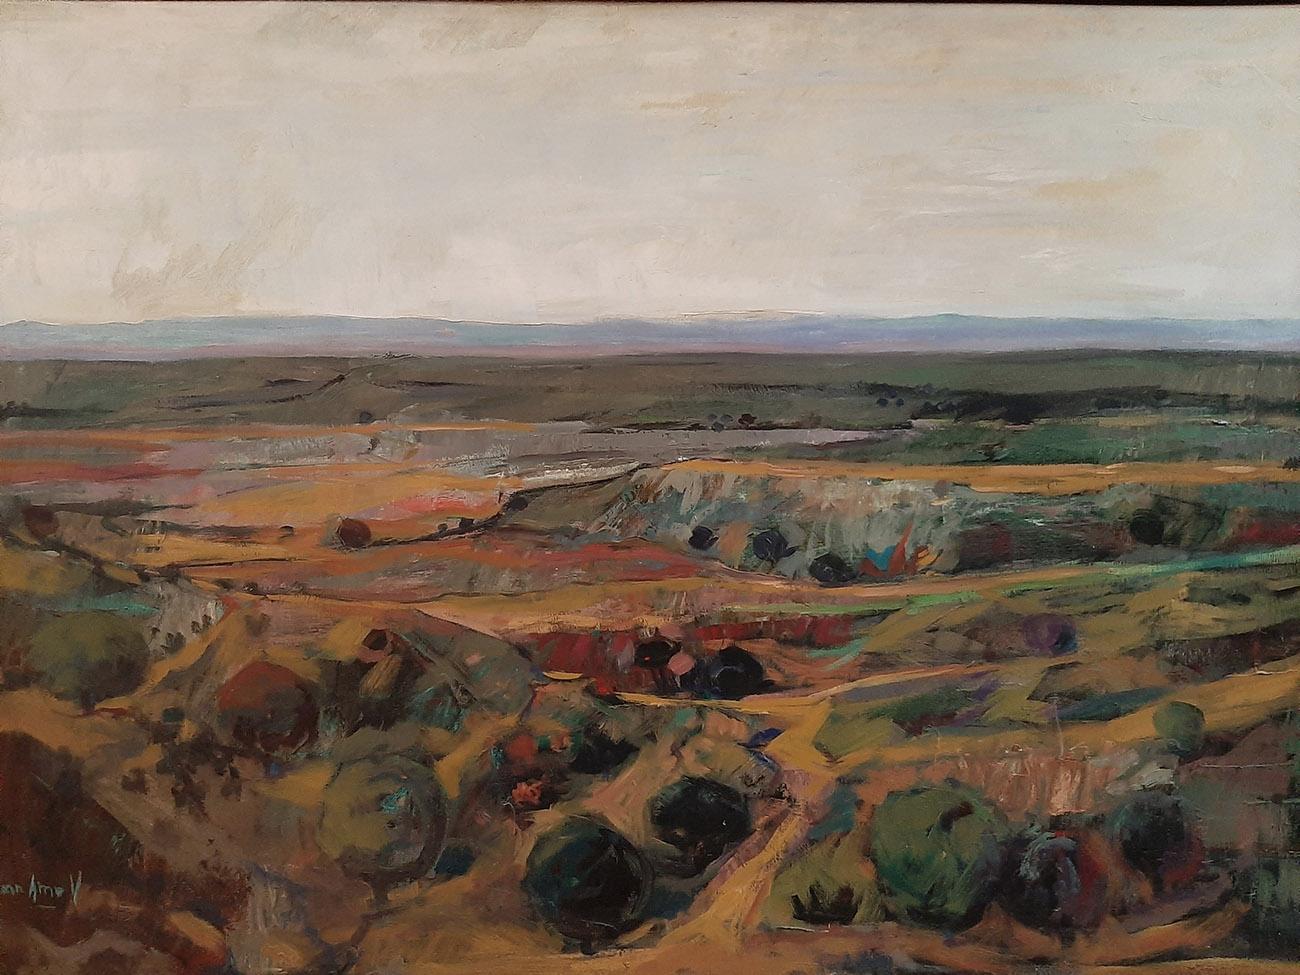 Juan Amo. (1979). La Mancha Serrana. Óleo - Lienzo. 67 x 94. Colección Privada.